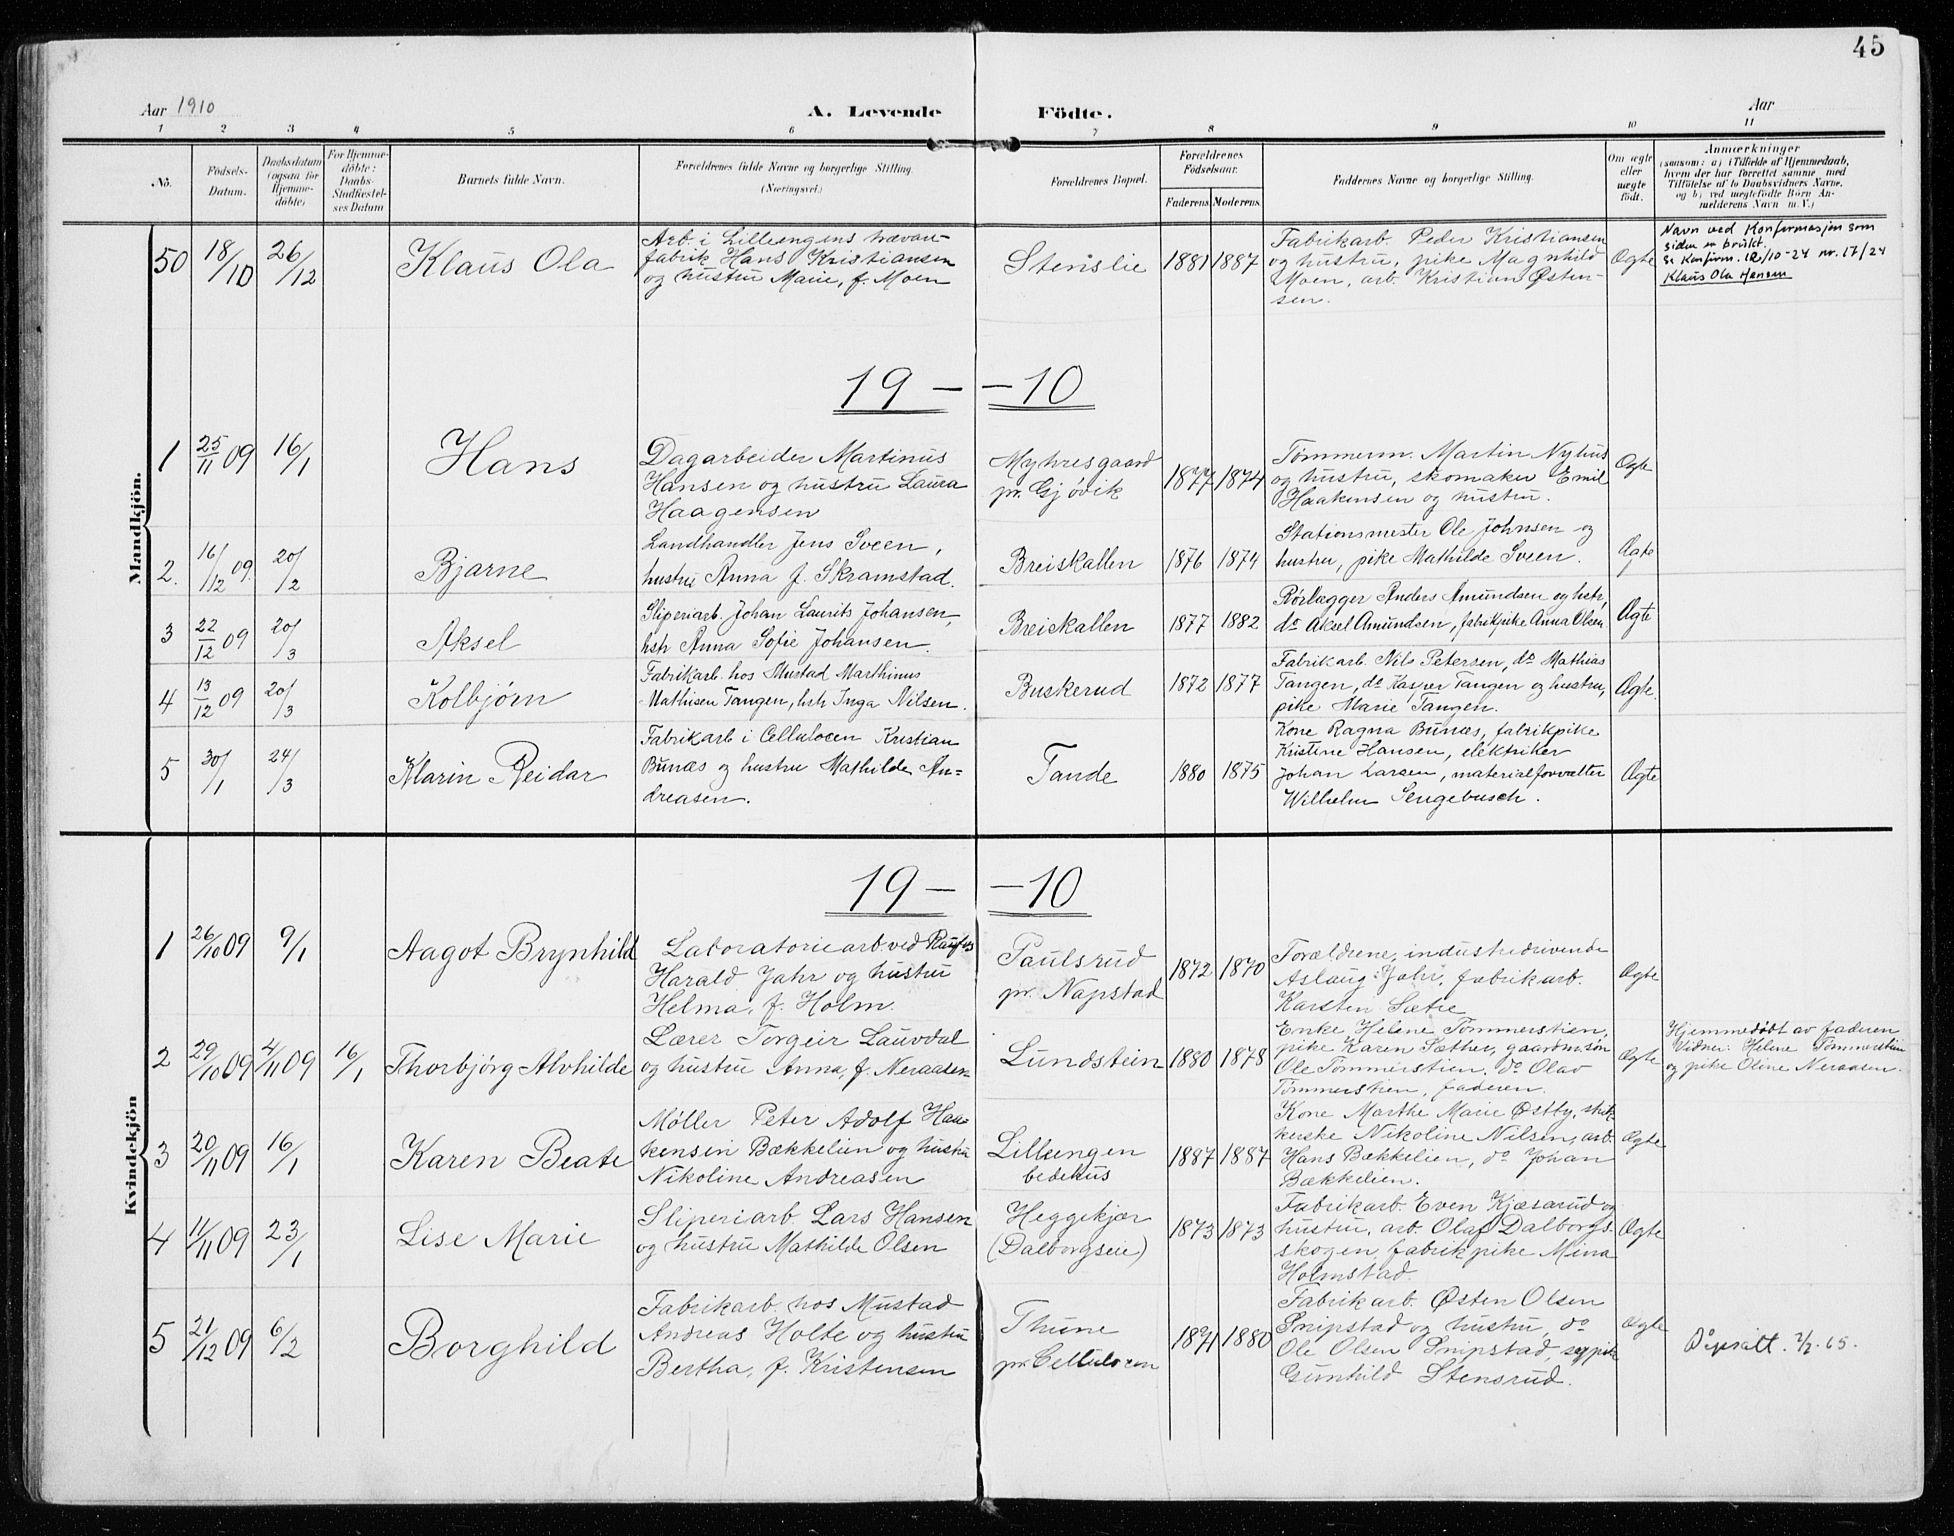 SAH, Vardal prestekontor, H/Ha/Haa/L0016: Ministerialbok nr. 16, 1904-1916, s. 45